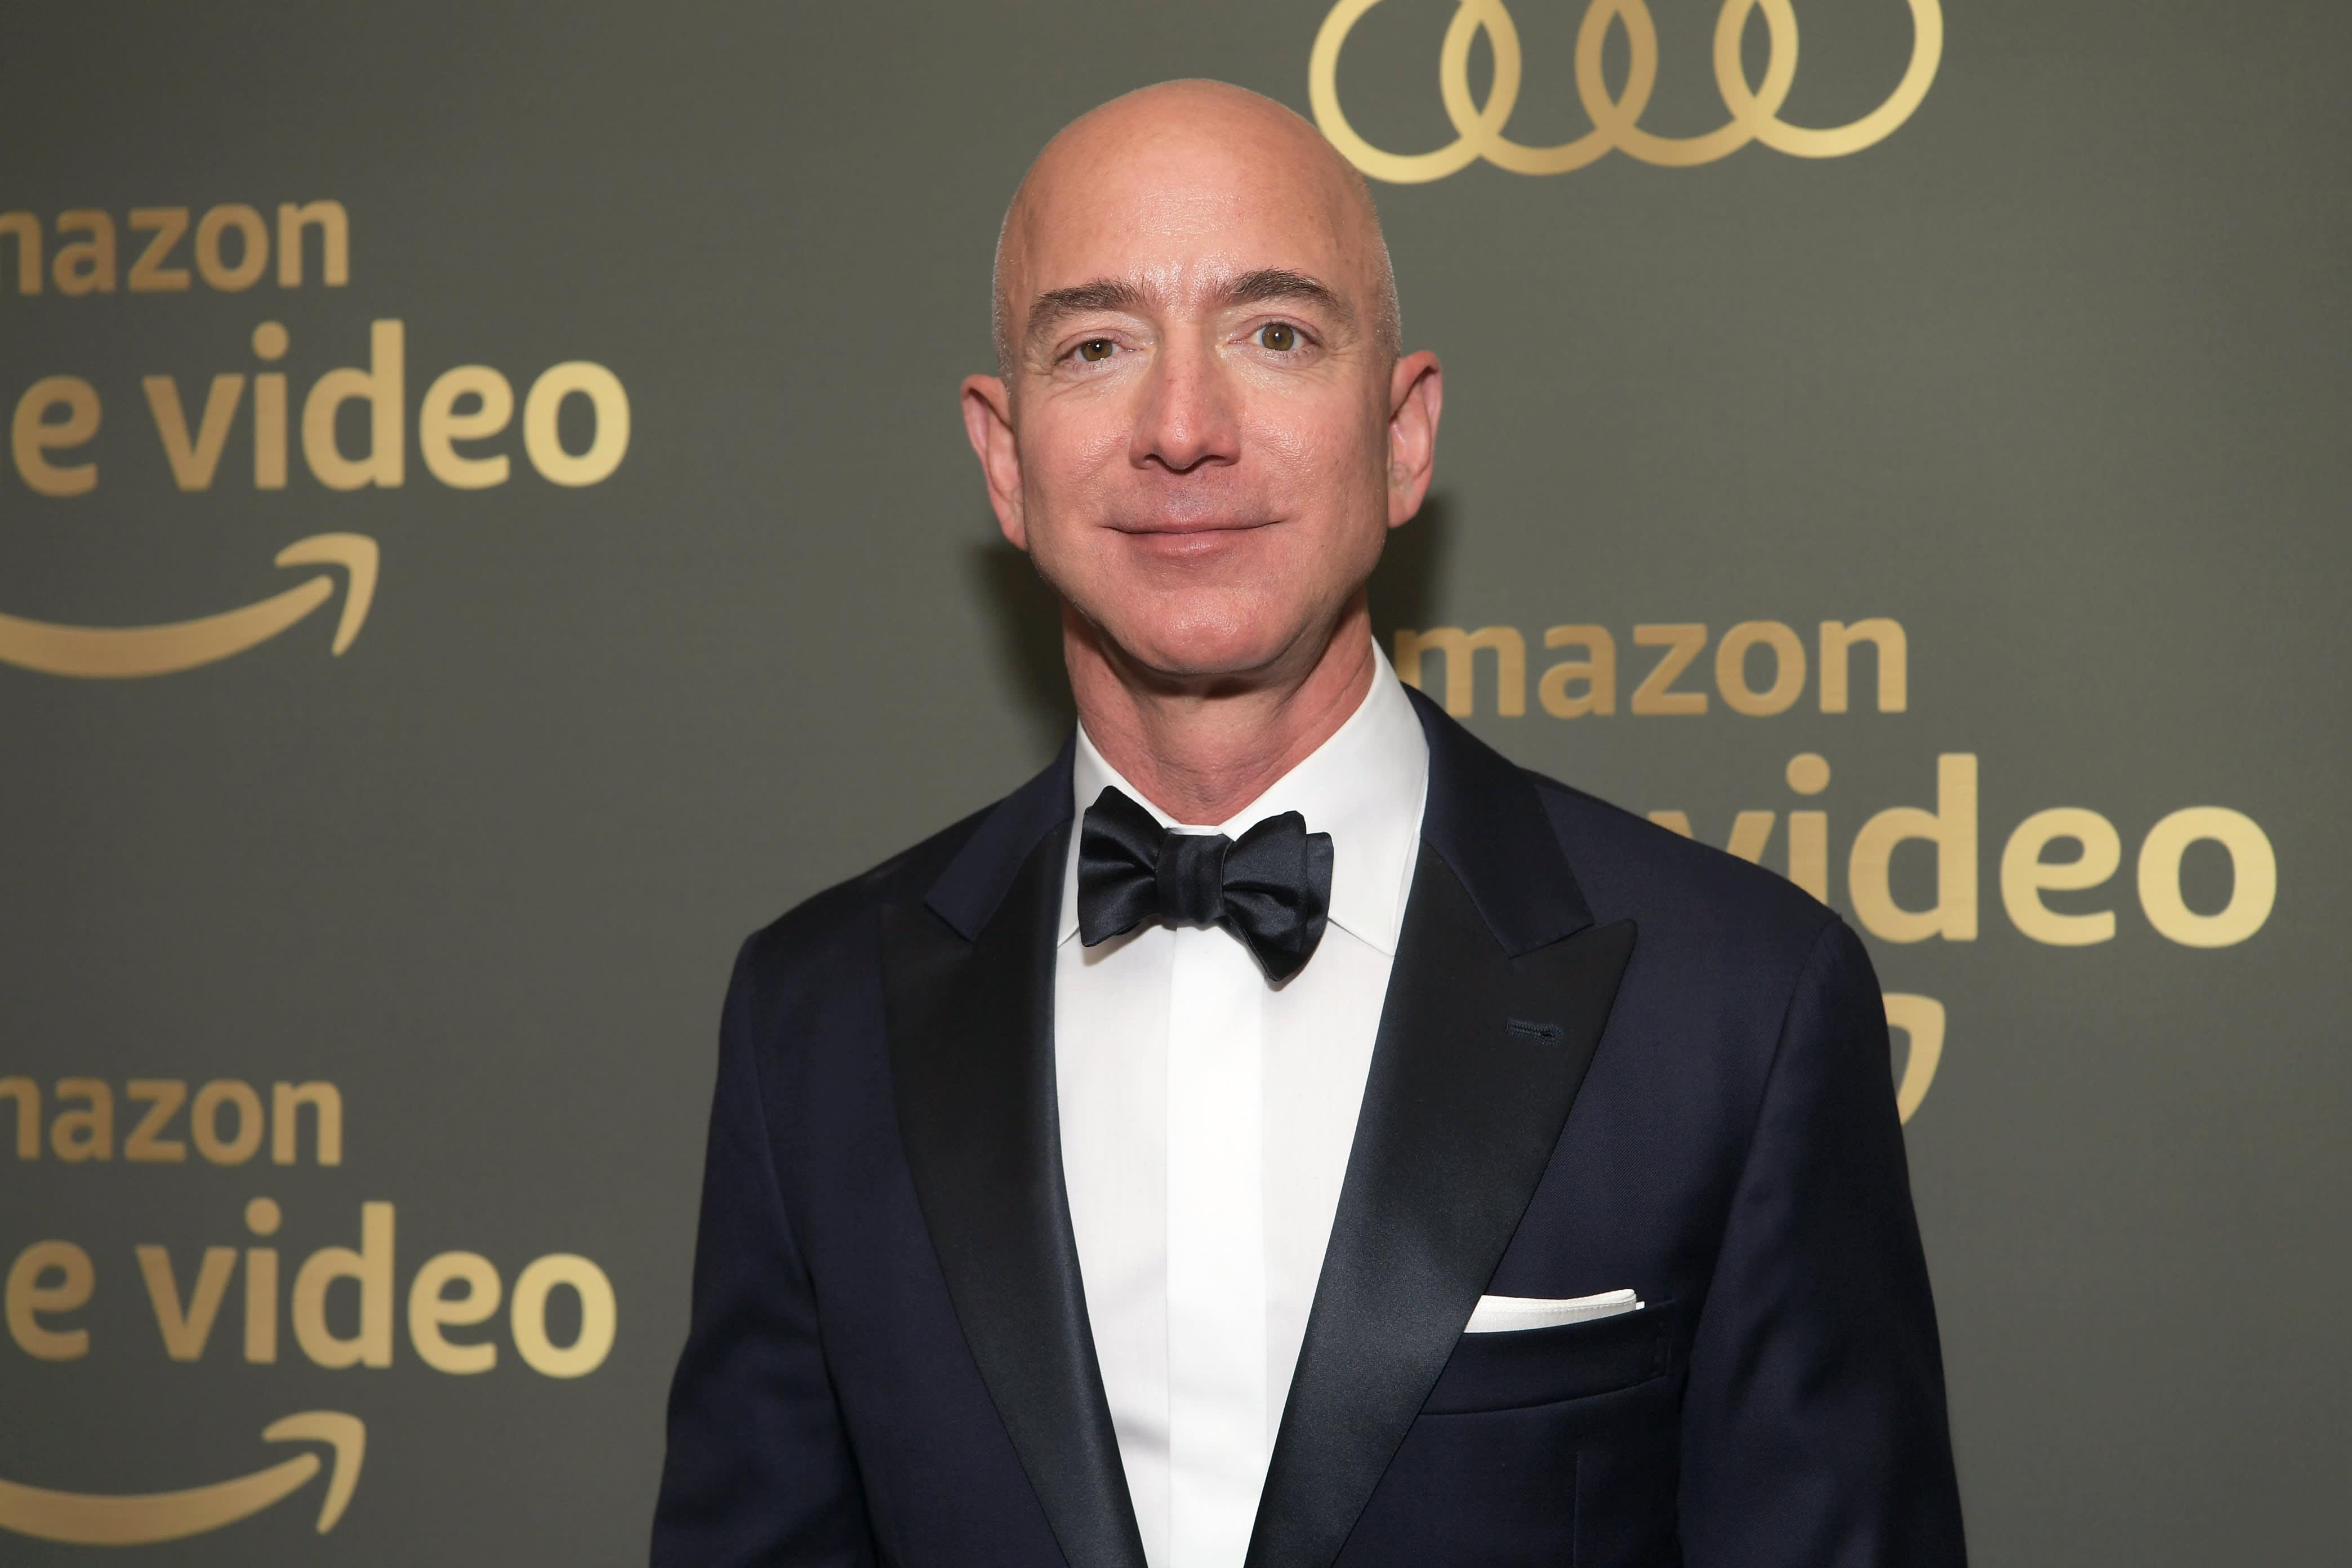 3 of billionaire Jeff Bezos' secrets to success